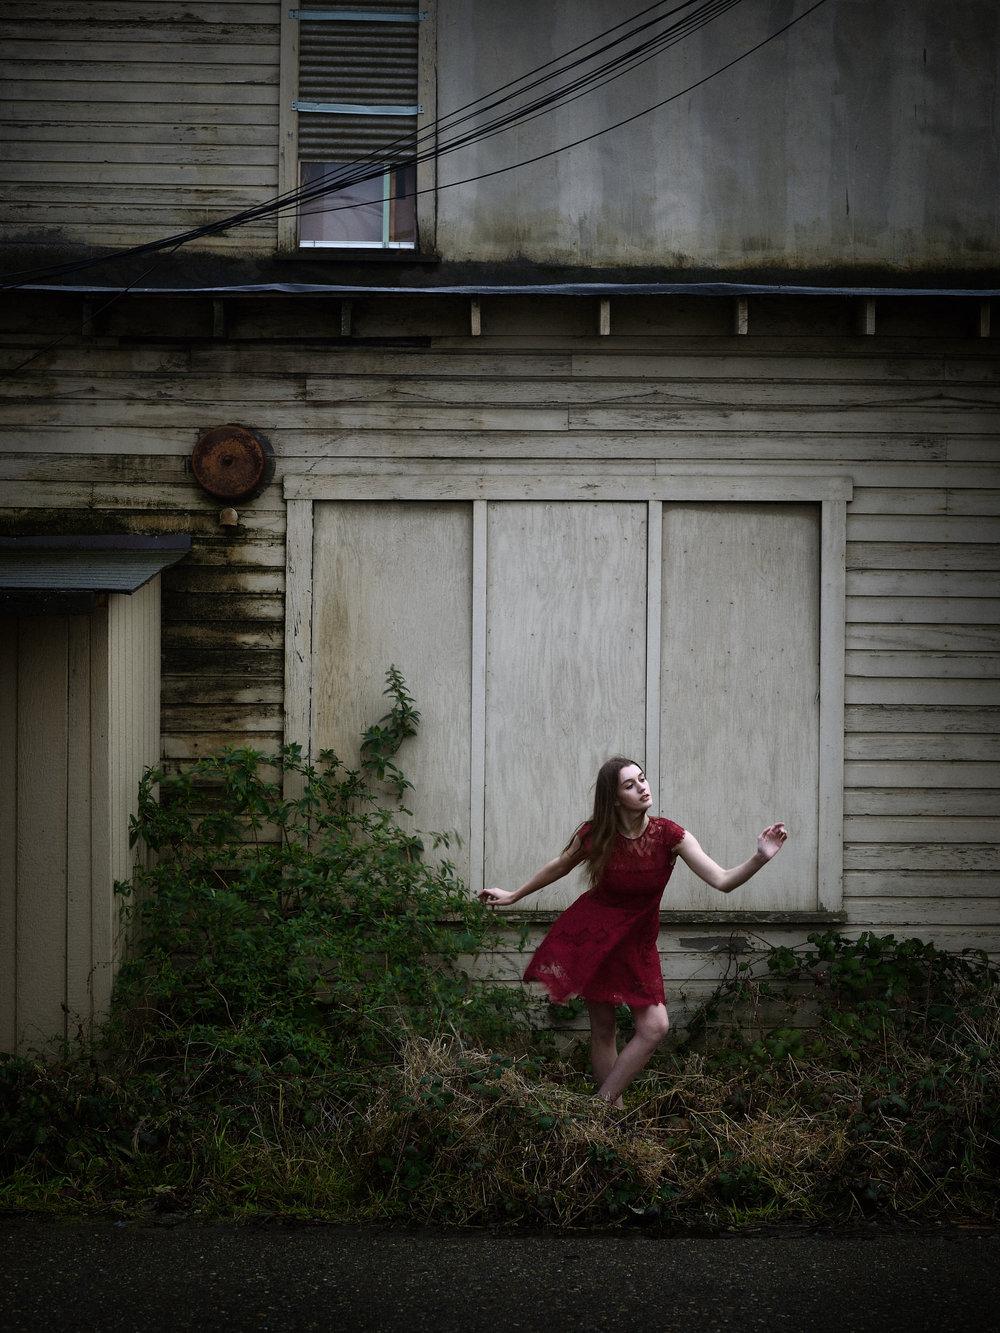 Chloe_house.jpg